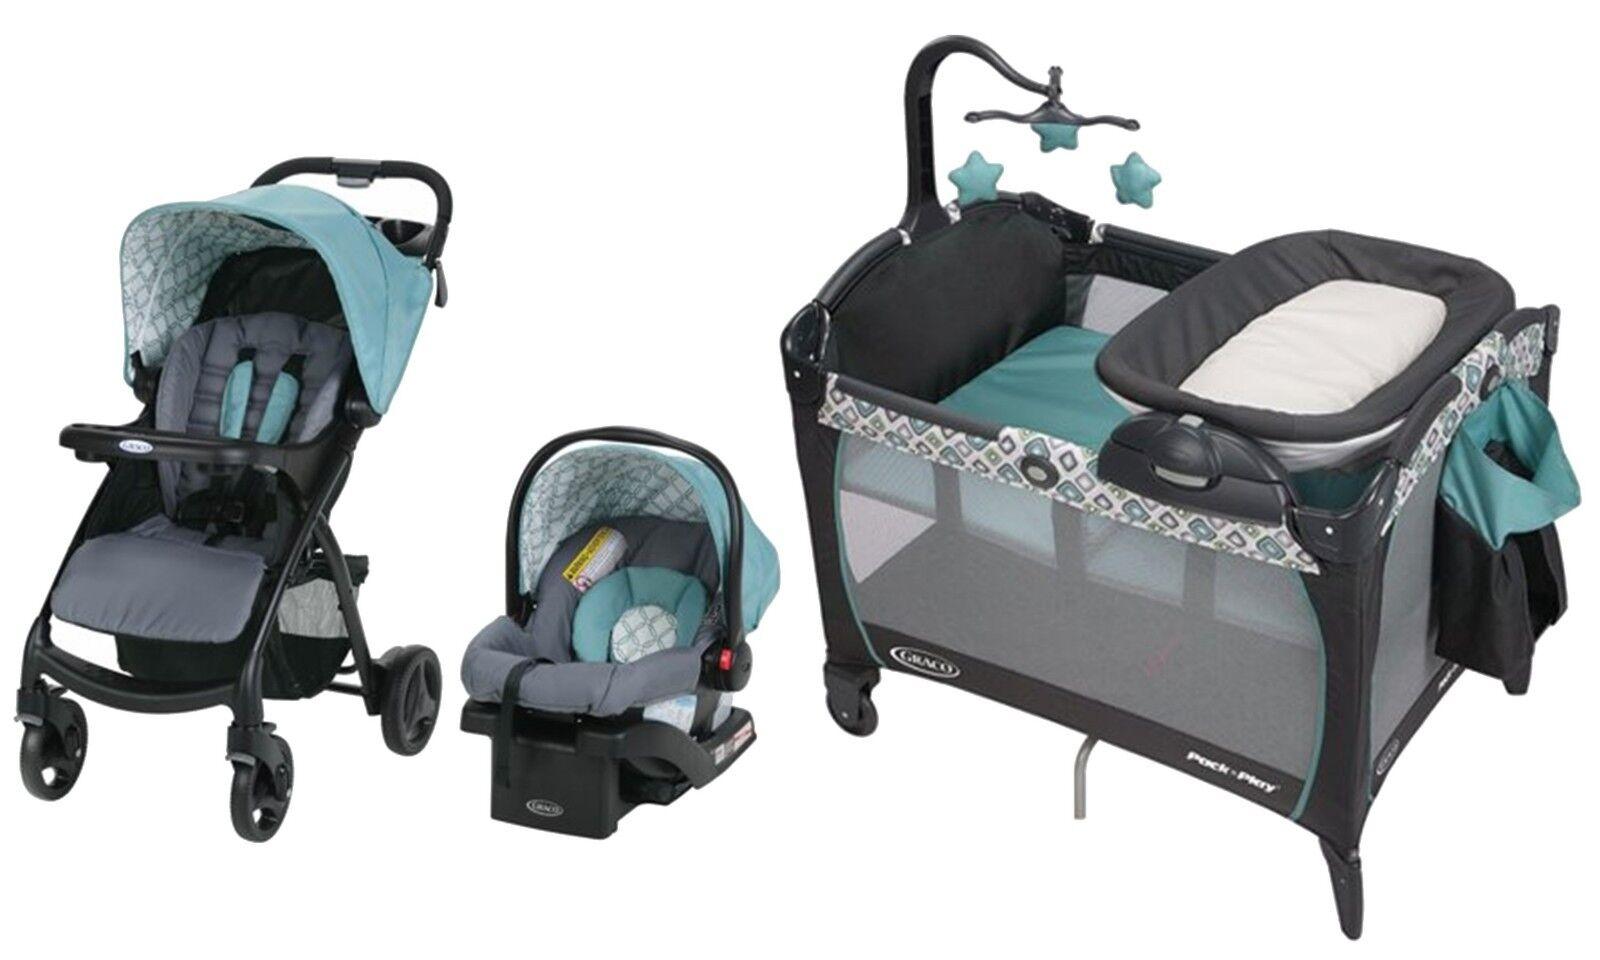 Graco Baby Stroller Infant Car Seat Playard Crib w/ Changer